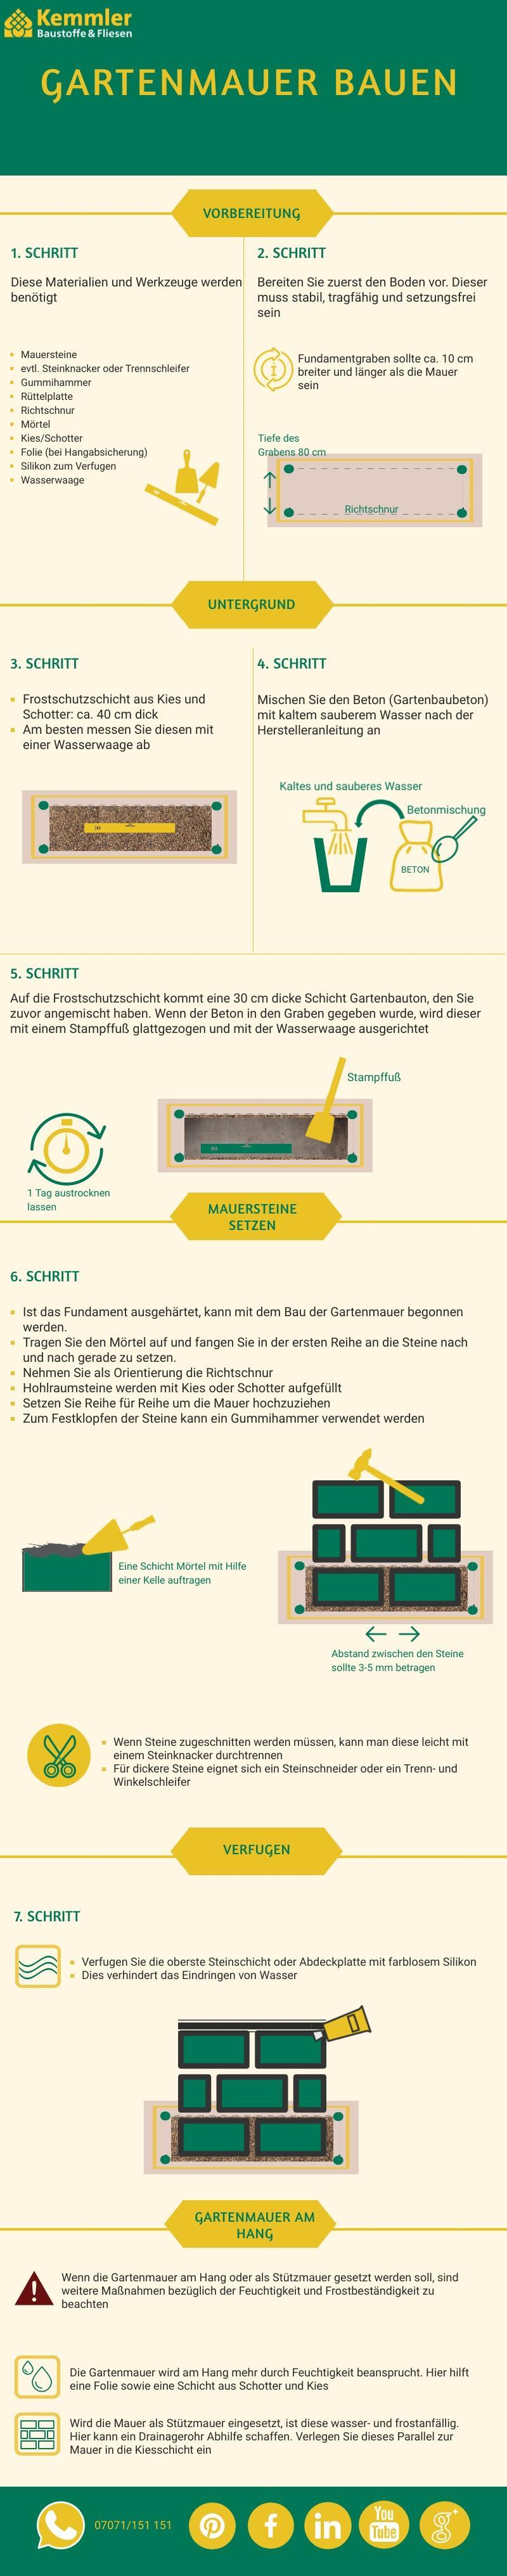 Infografik Gartenmauer bauen